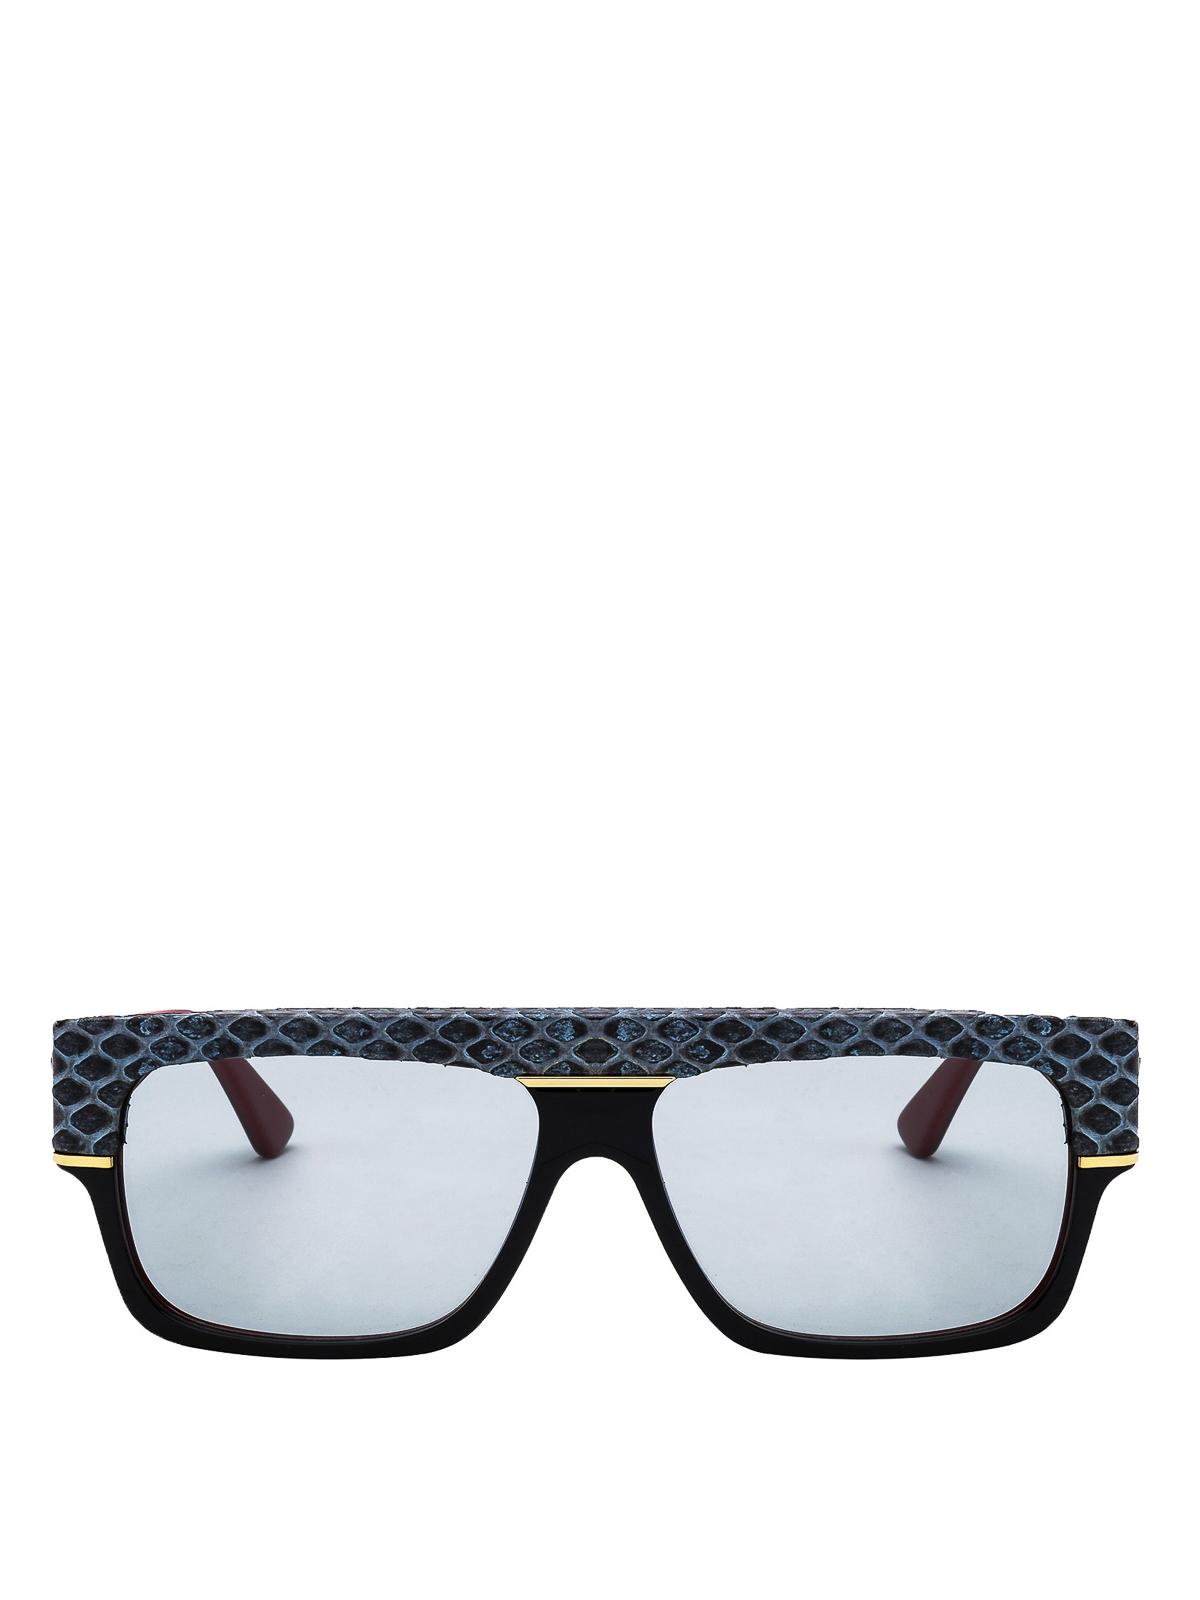 cf5c9d21e65a0 Gucci - Grey python print acetate sunglasses - sunglasses - GG0483S005